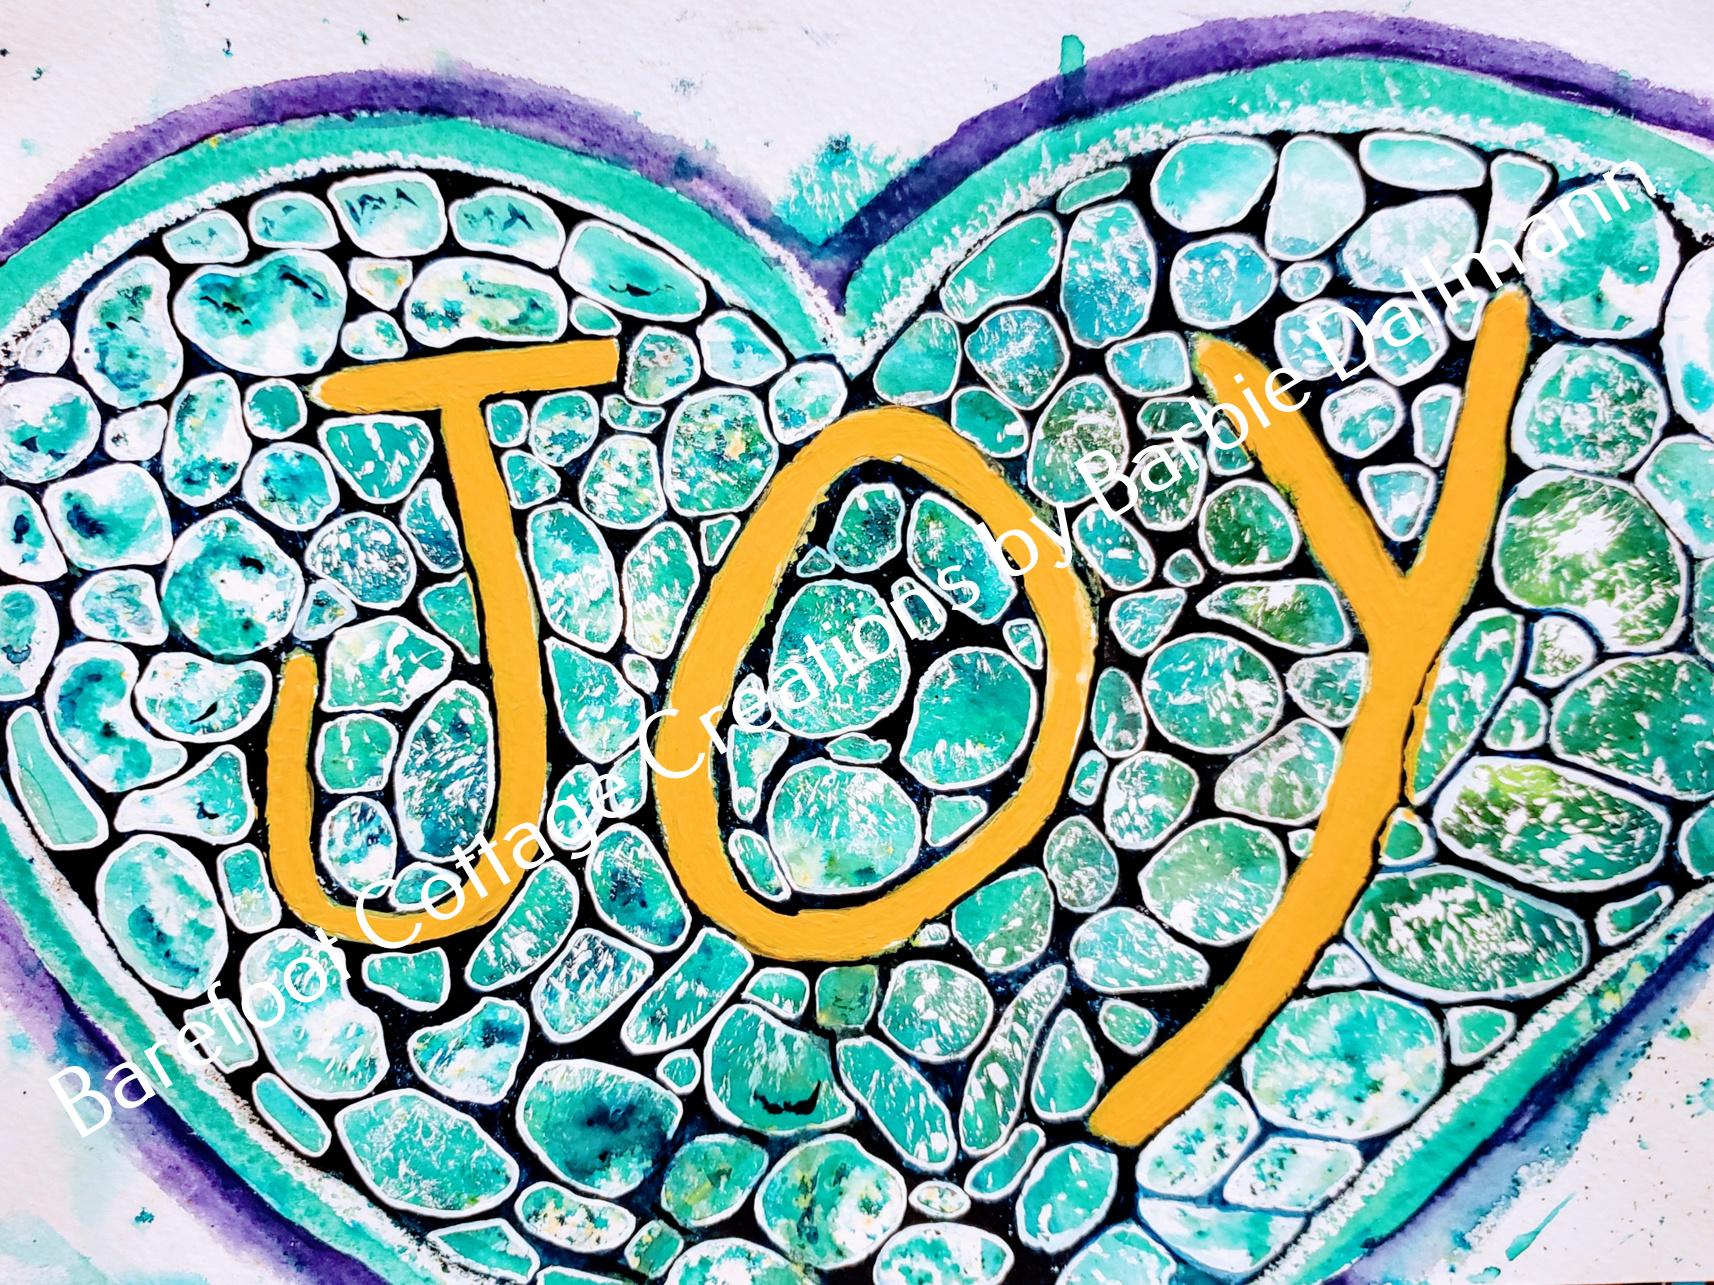 12 - Joy to the World